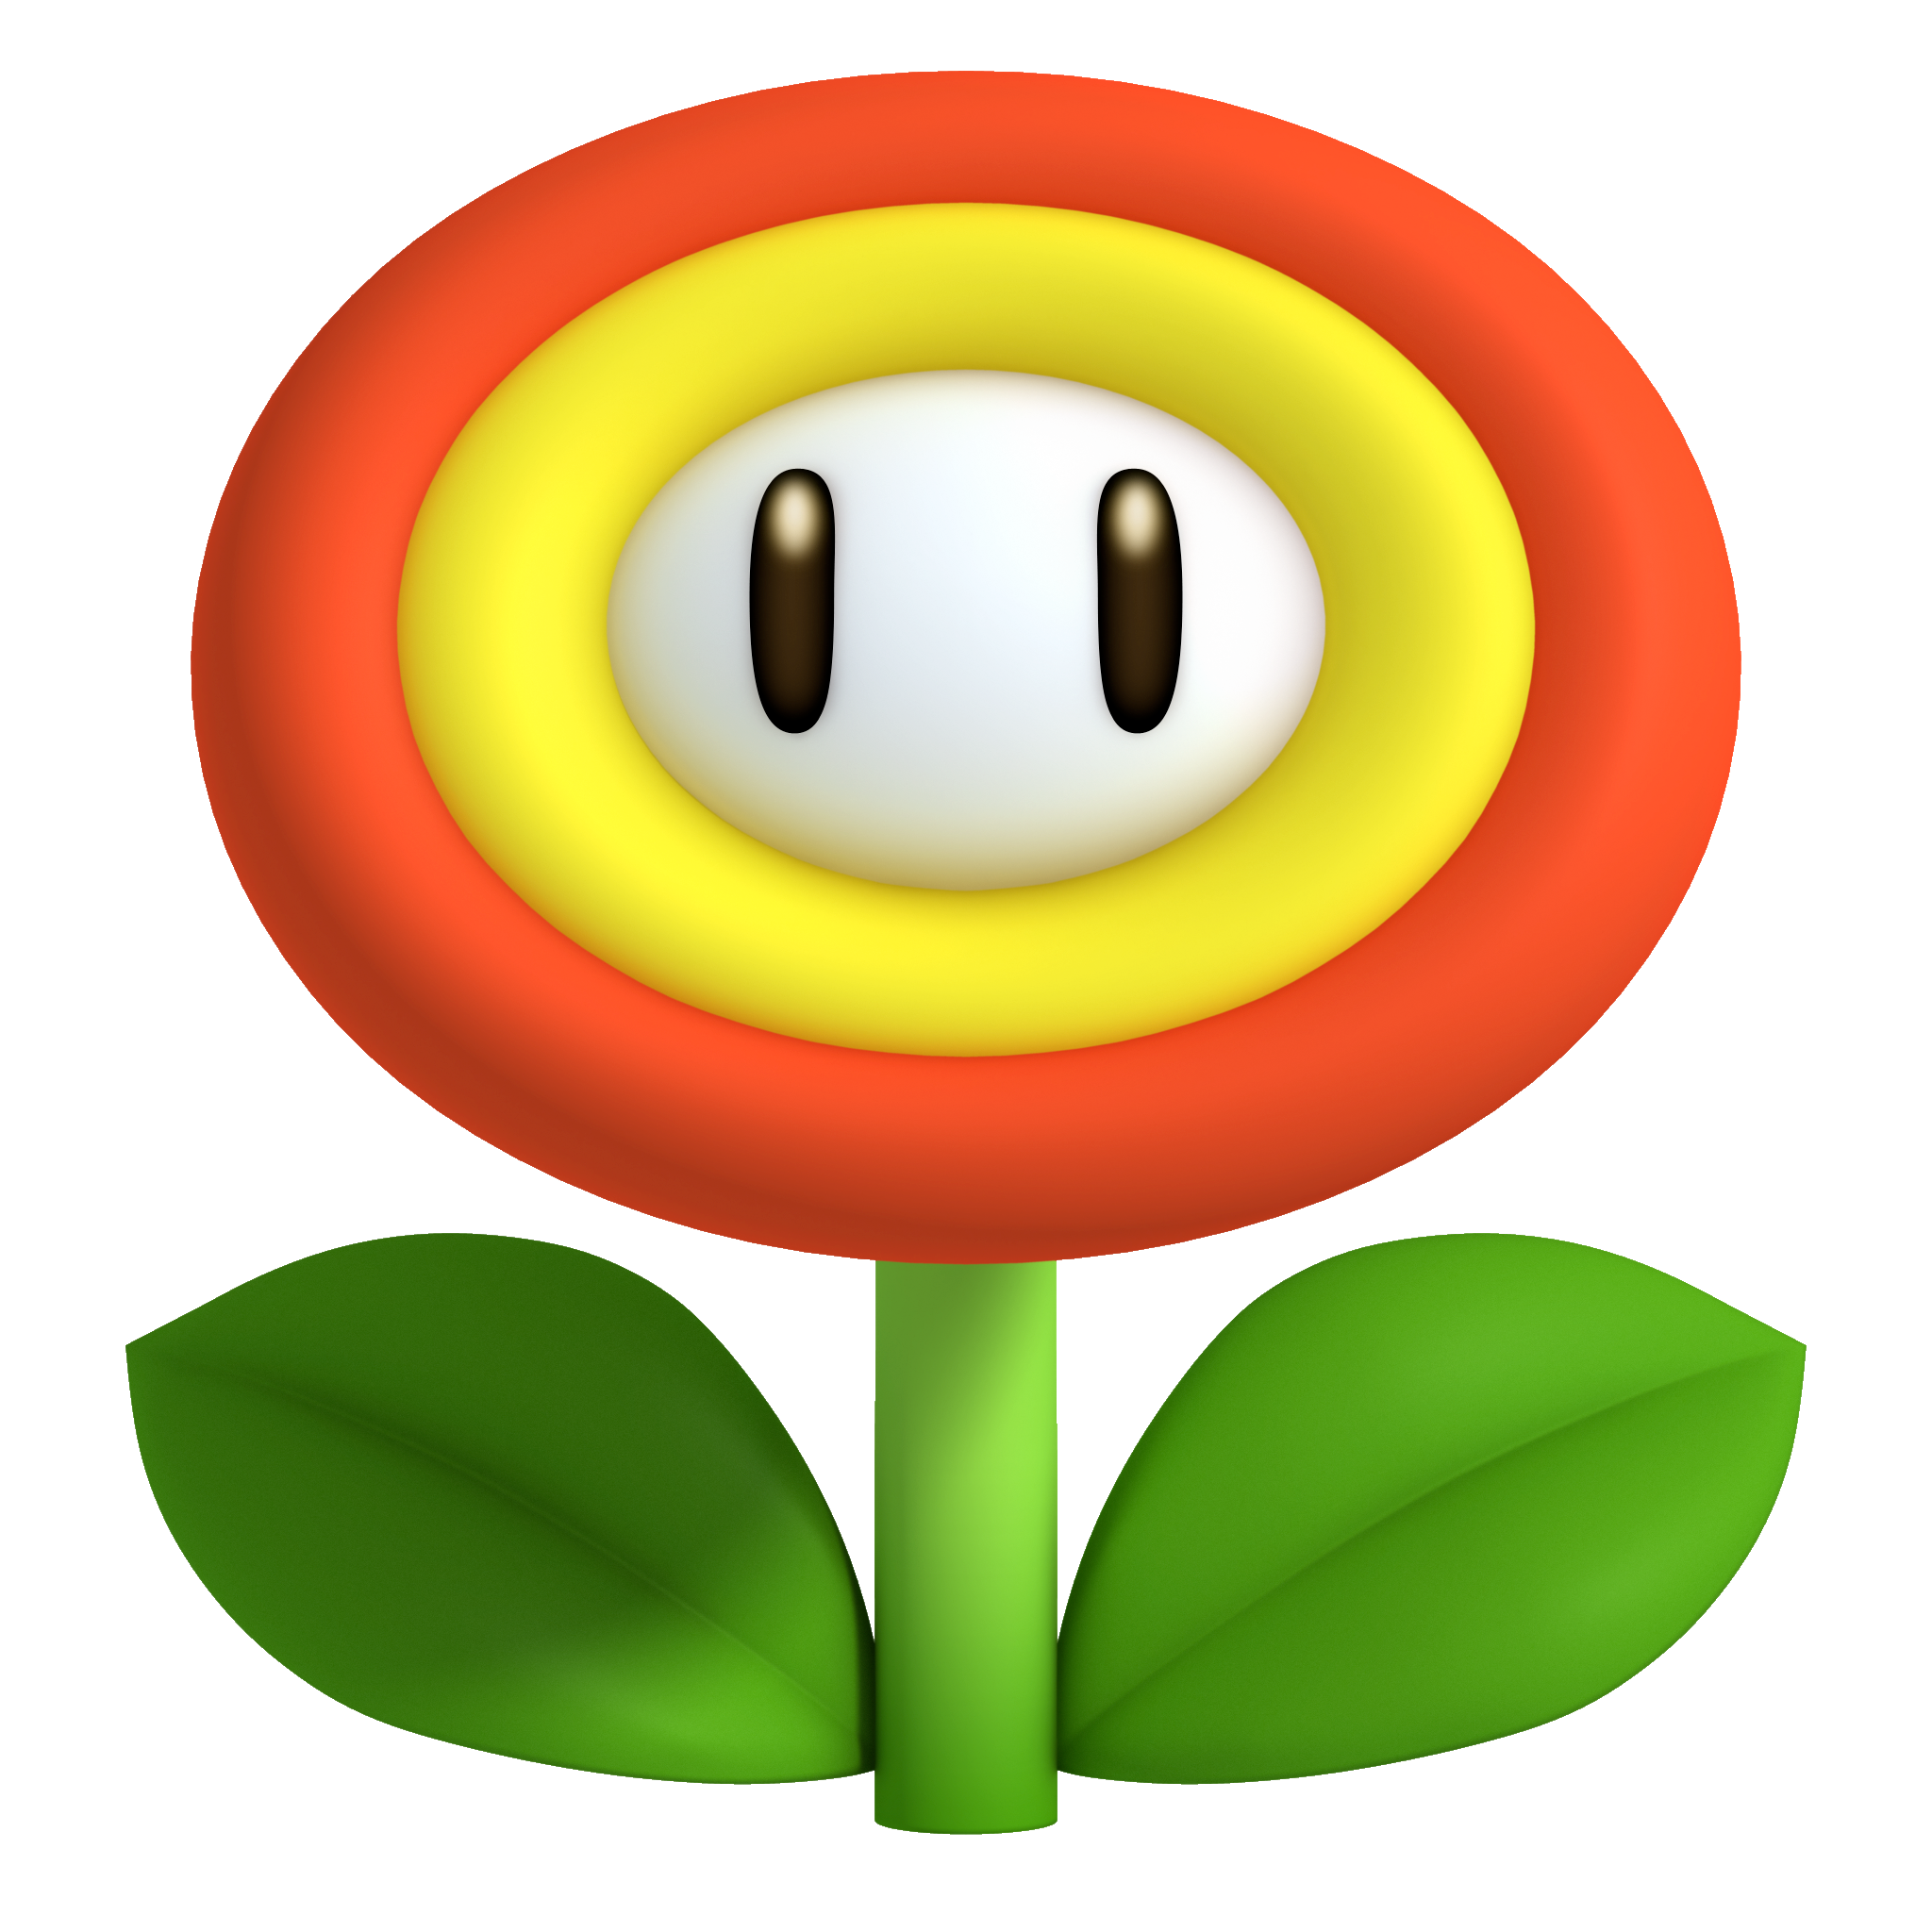 Mario fire flower coloring pages - Mario Flower Recherche Google